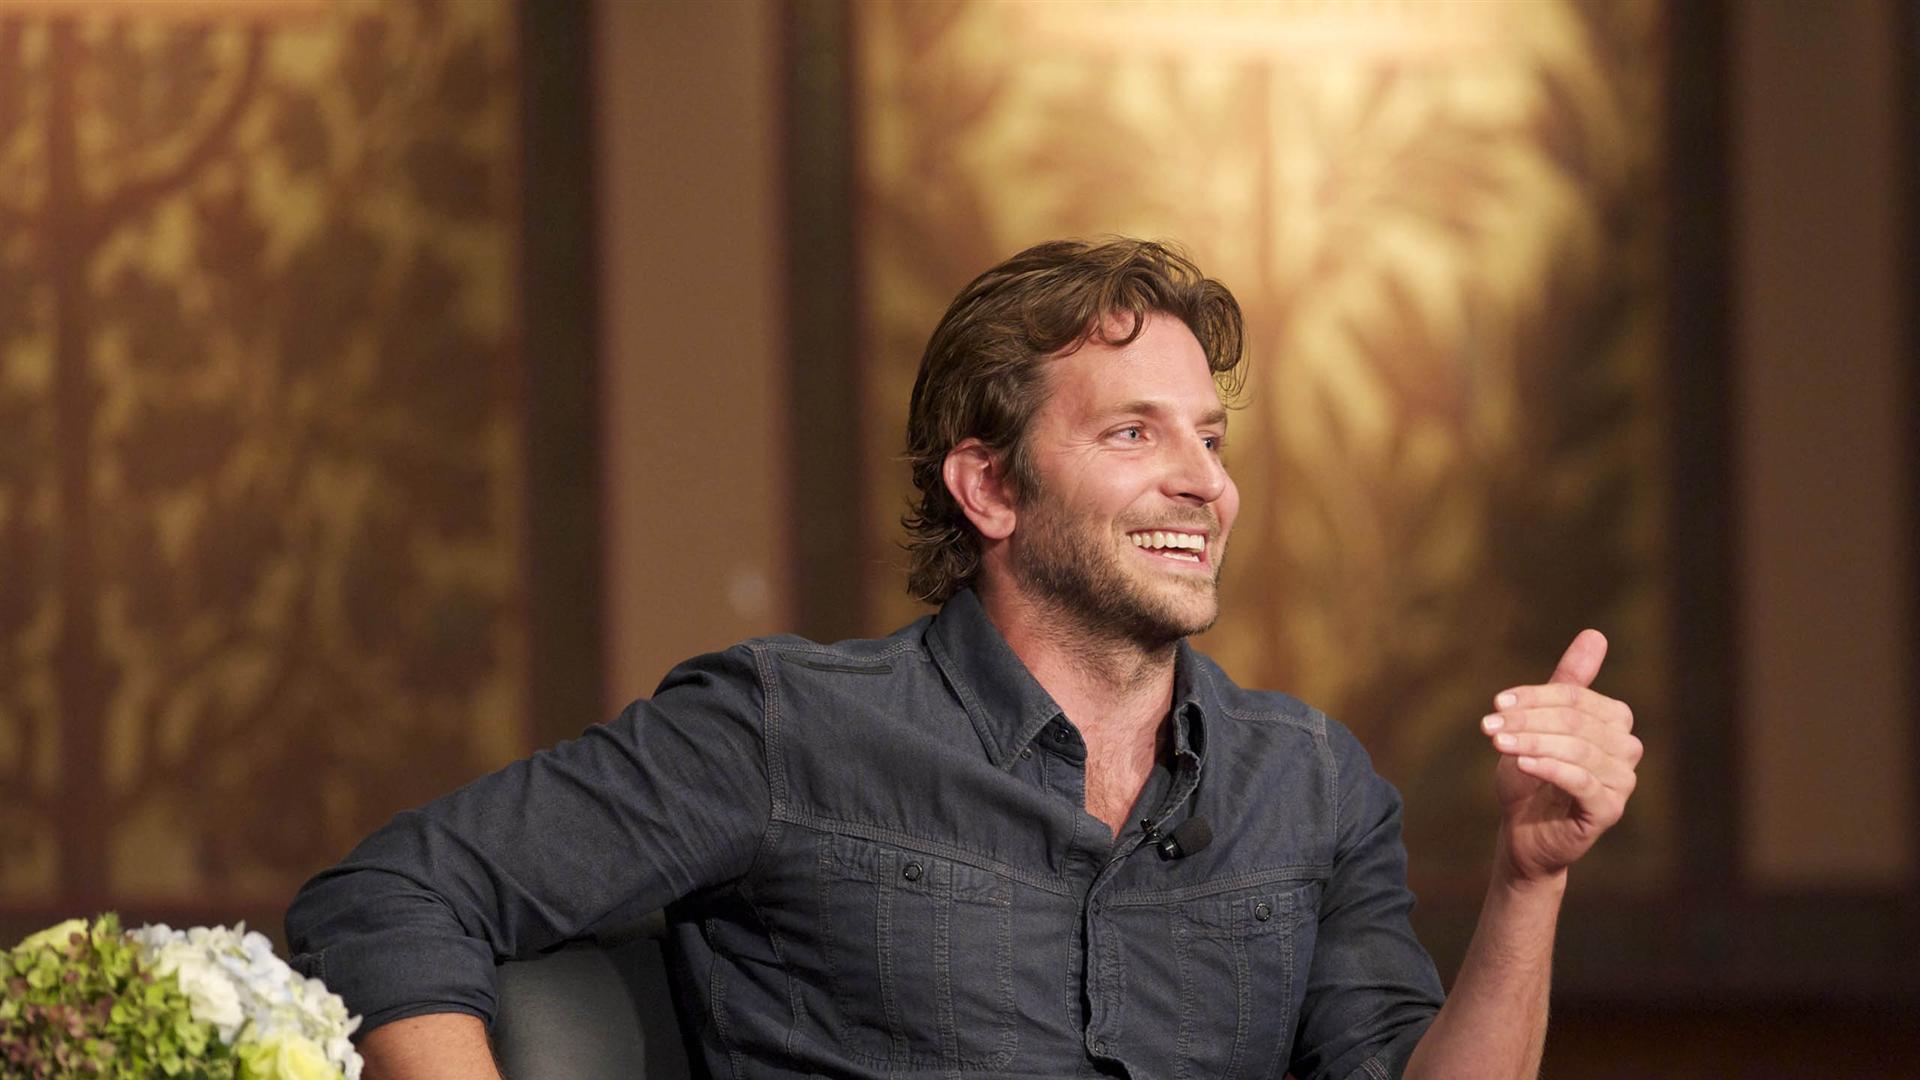 Bradley Cooper on Talk Show Full HD Desktop Wallpapers 1080p 1920x1080